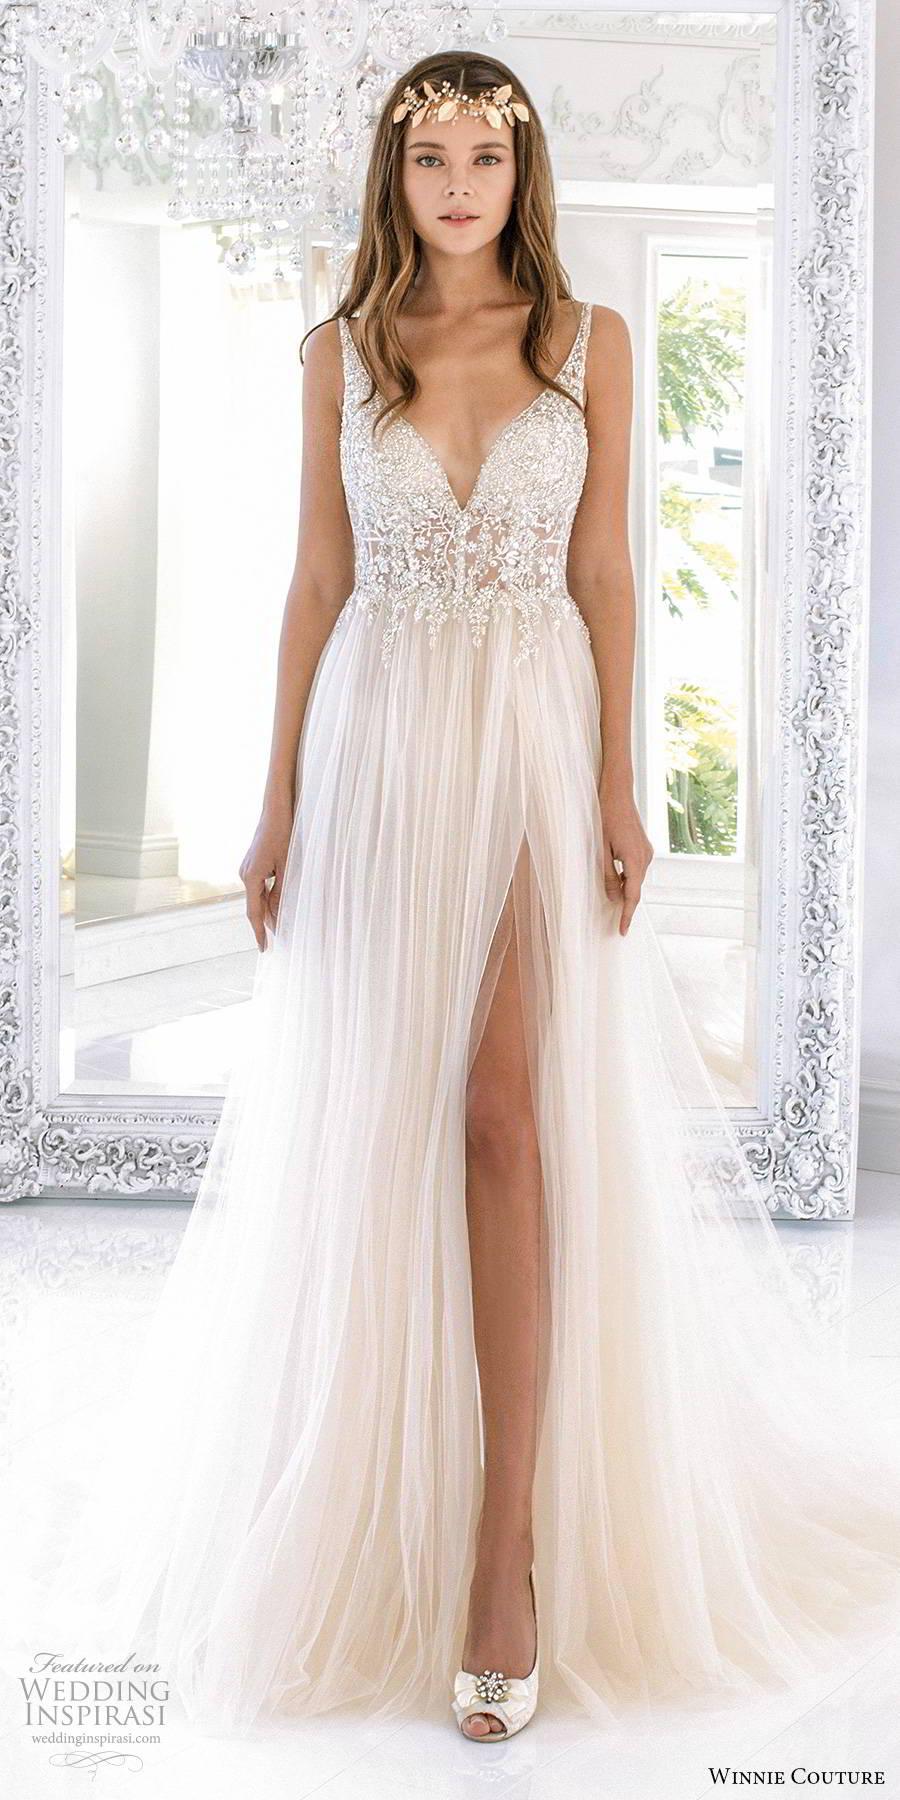 winnie couture 2019 bridal sleevless straps deep v neckline embellished sheer bodice romantic soft a line wedding dress slit skirt (9) mv